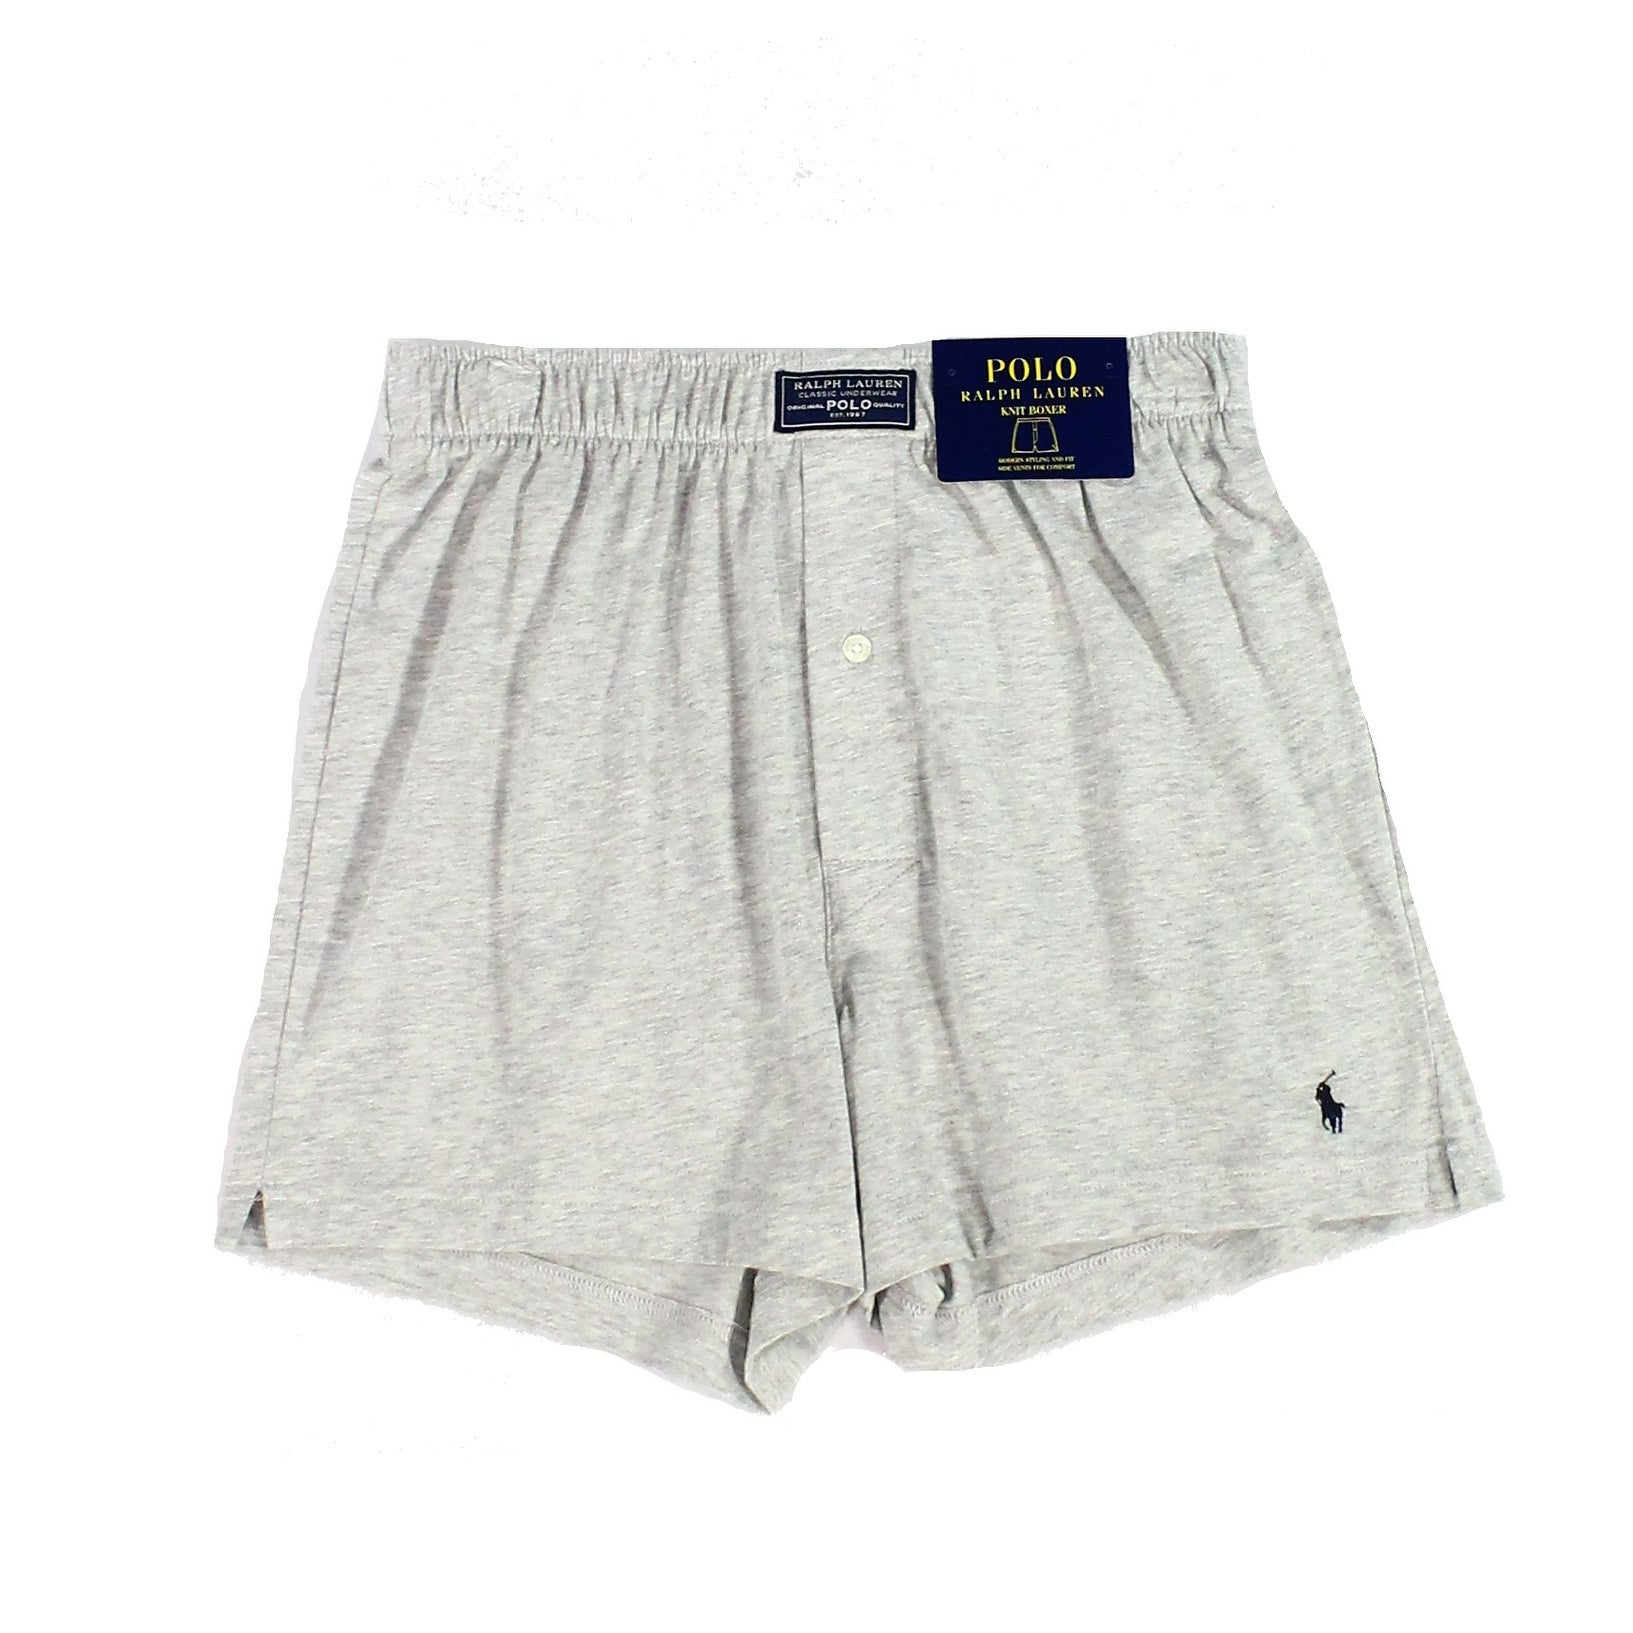 6b243d68d817 Polo Ralph Lauren Underwear | Find Great Men's Clothing Deals Shopping at  Overstock